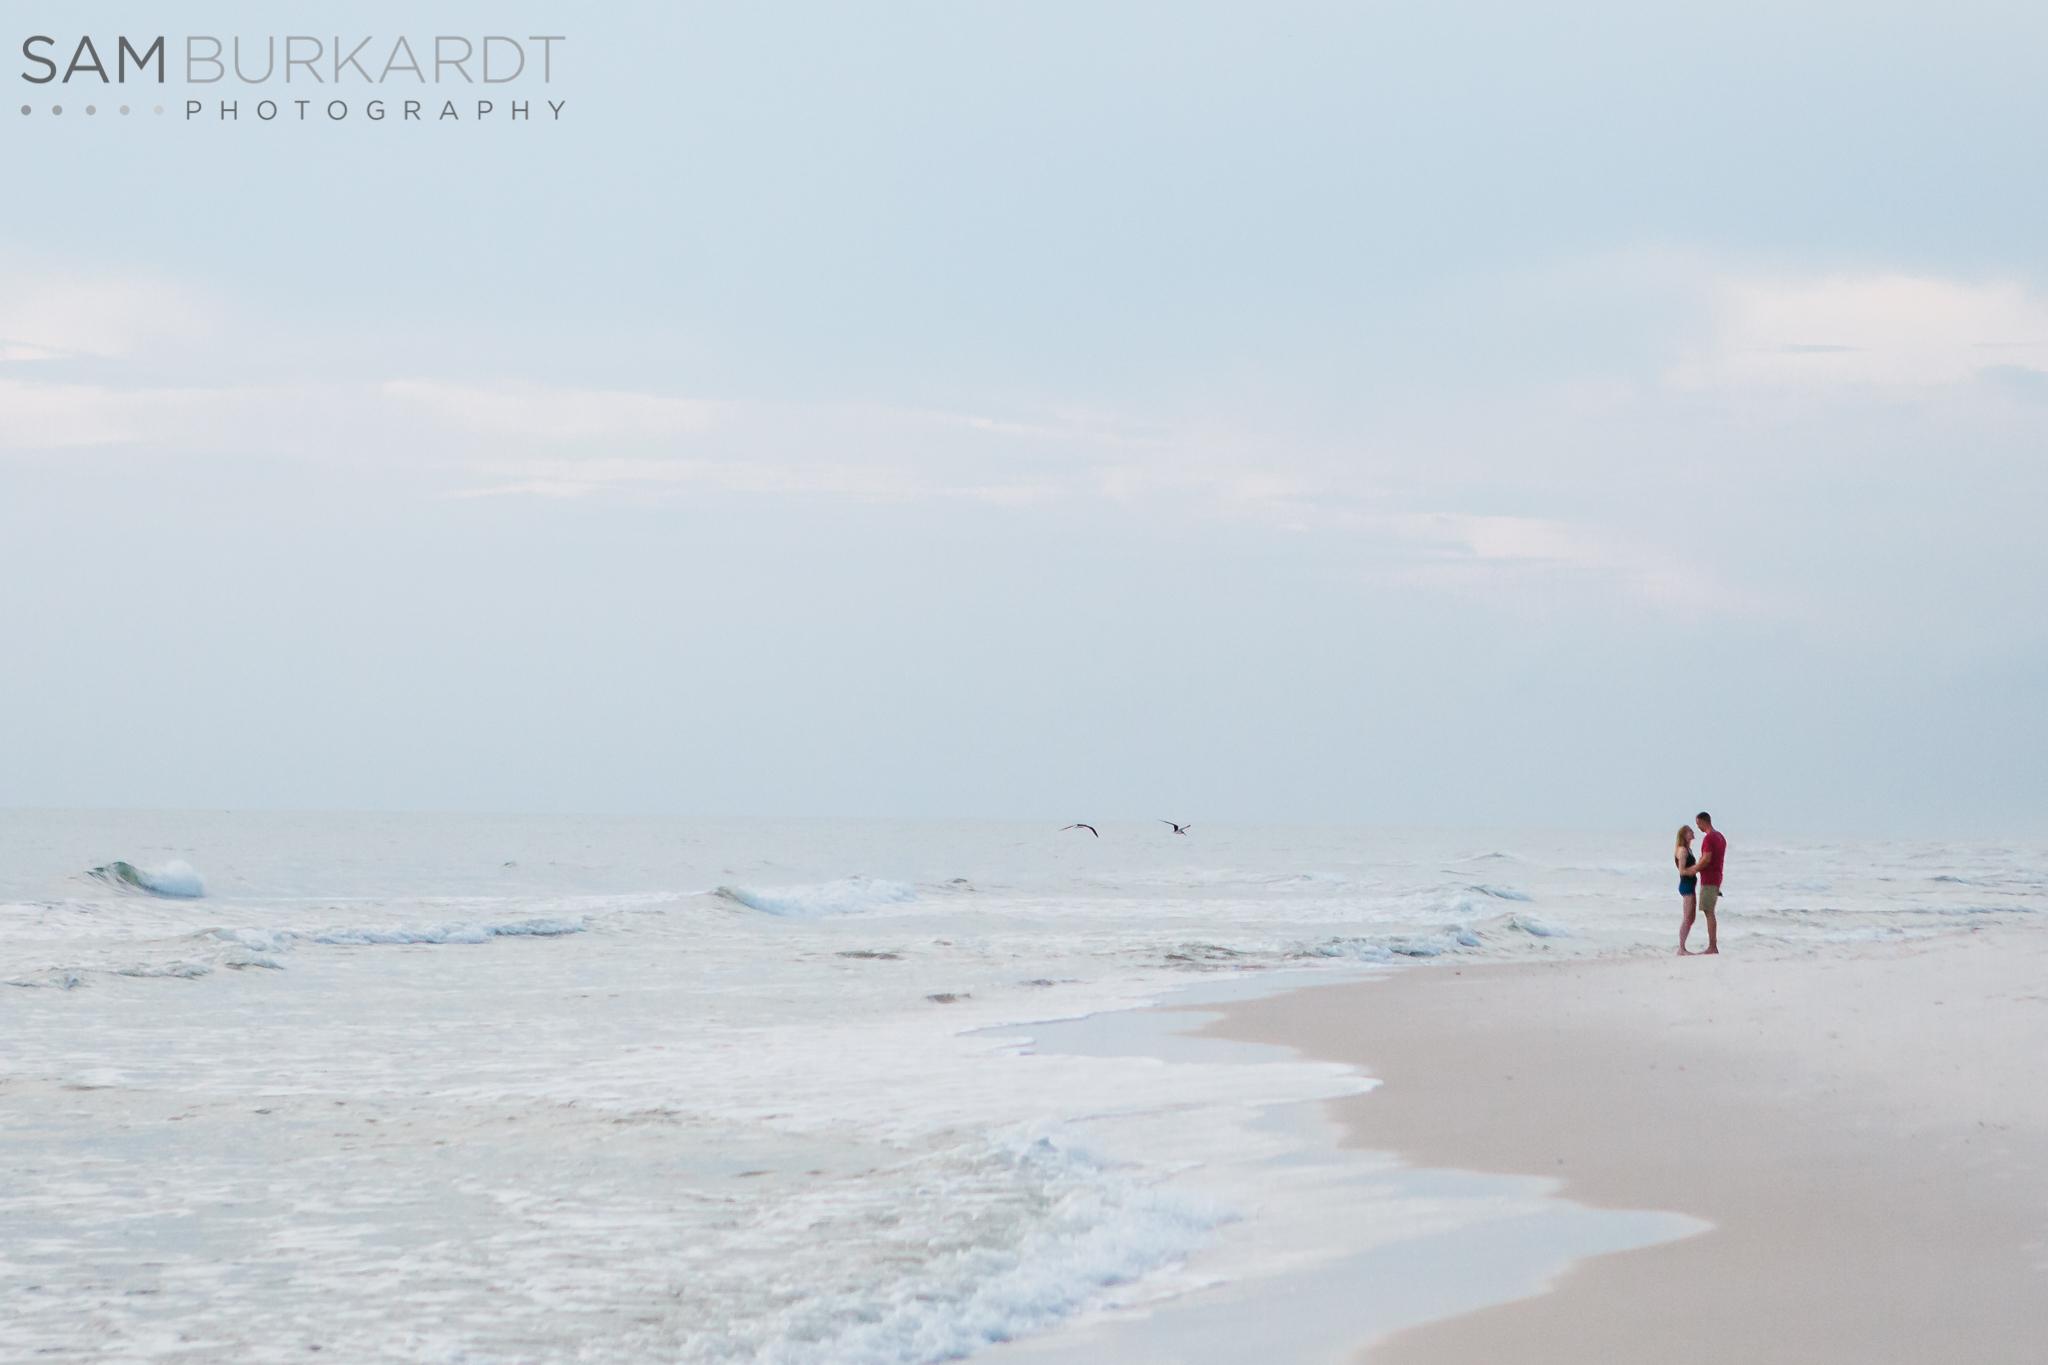 samburkardt_engagement_vacation_beach_cape_san_blas_florida_camping_gopro_0003.jpg